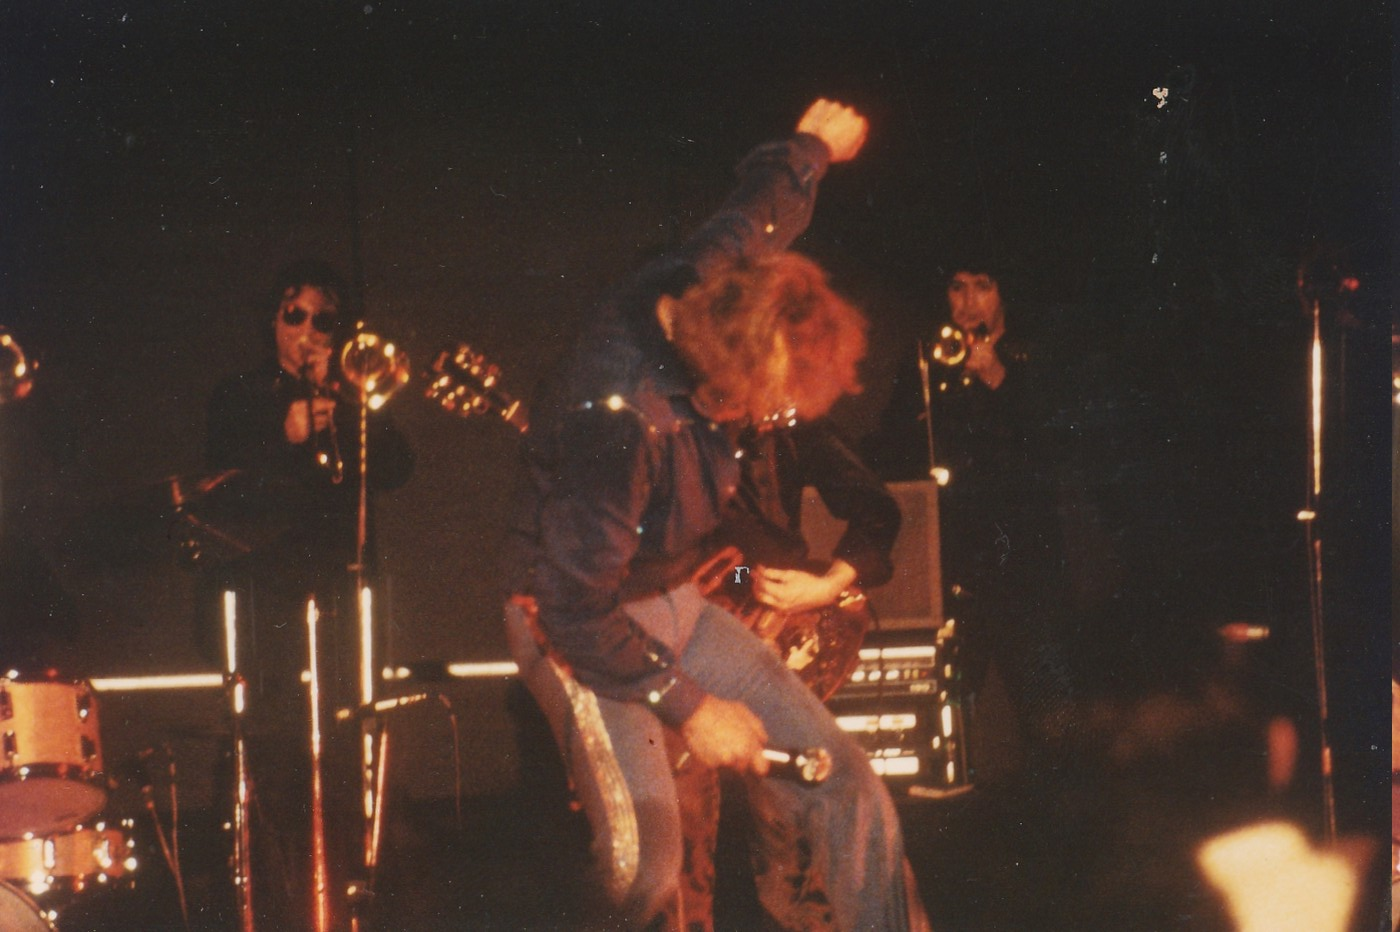 INÉDIT  :  JOHNNY HALLYDAY EN TOURNEE - HIVER 1978 -1979 ( PHOTOS INÉDITES )   Img_2630